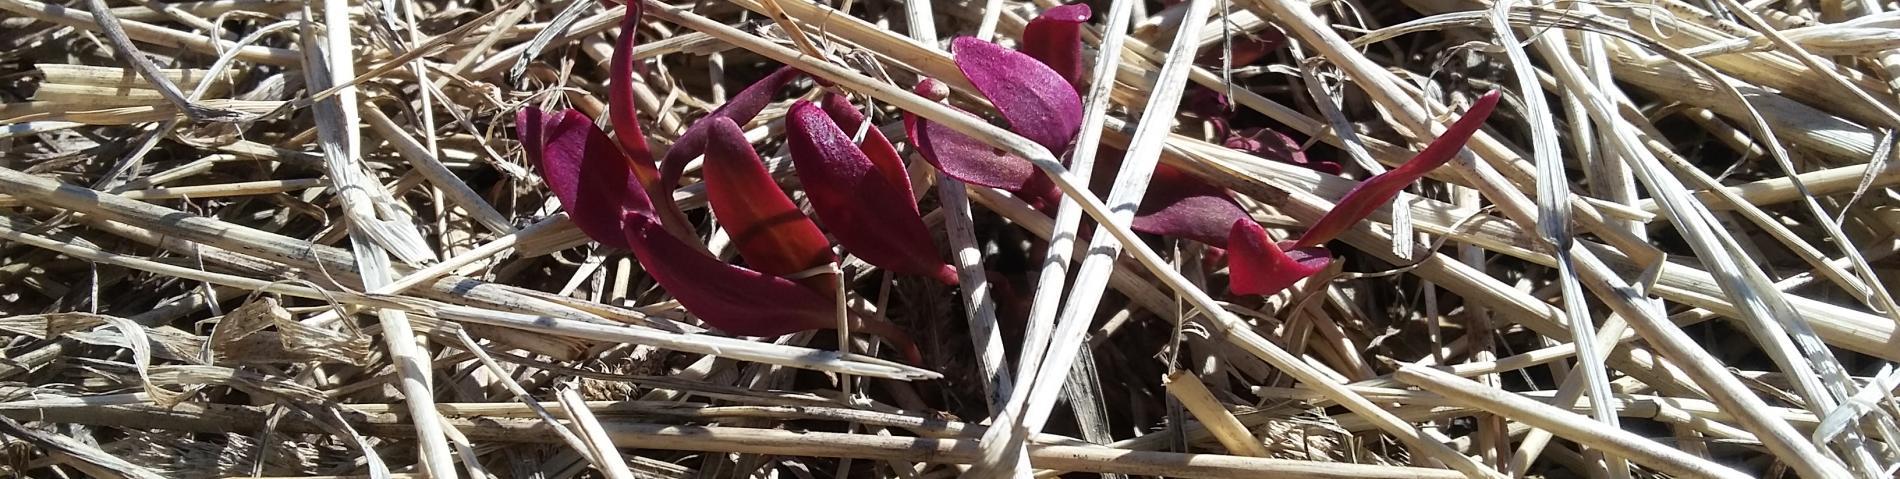 Red salad in mulch